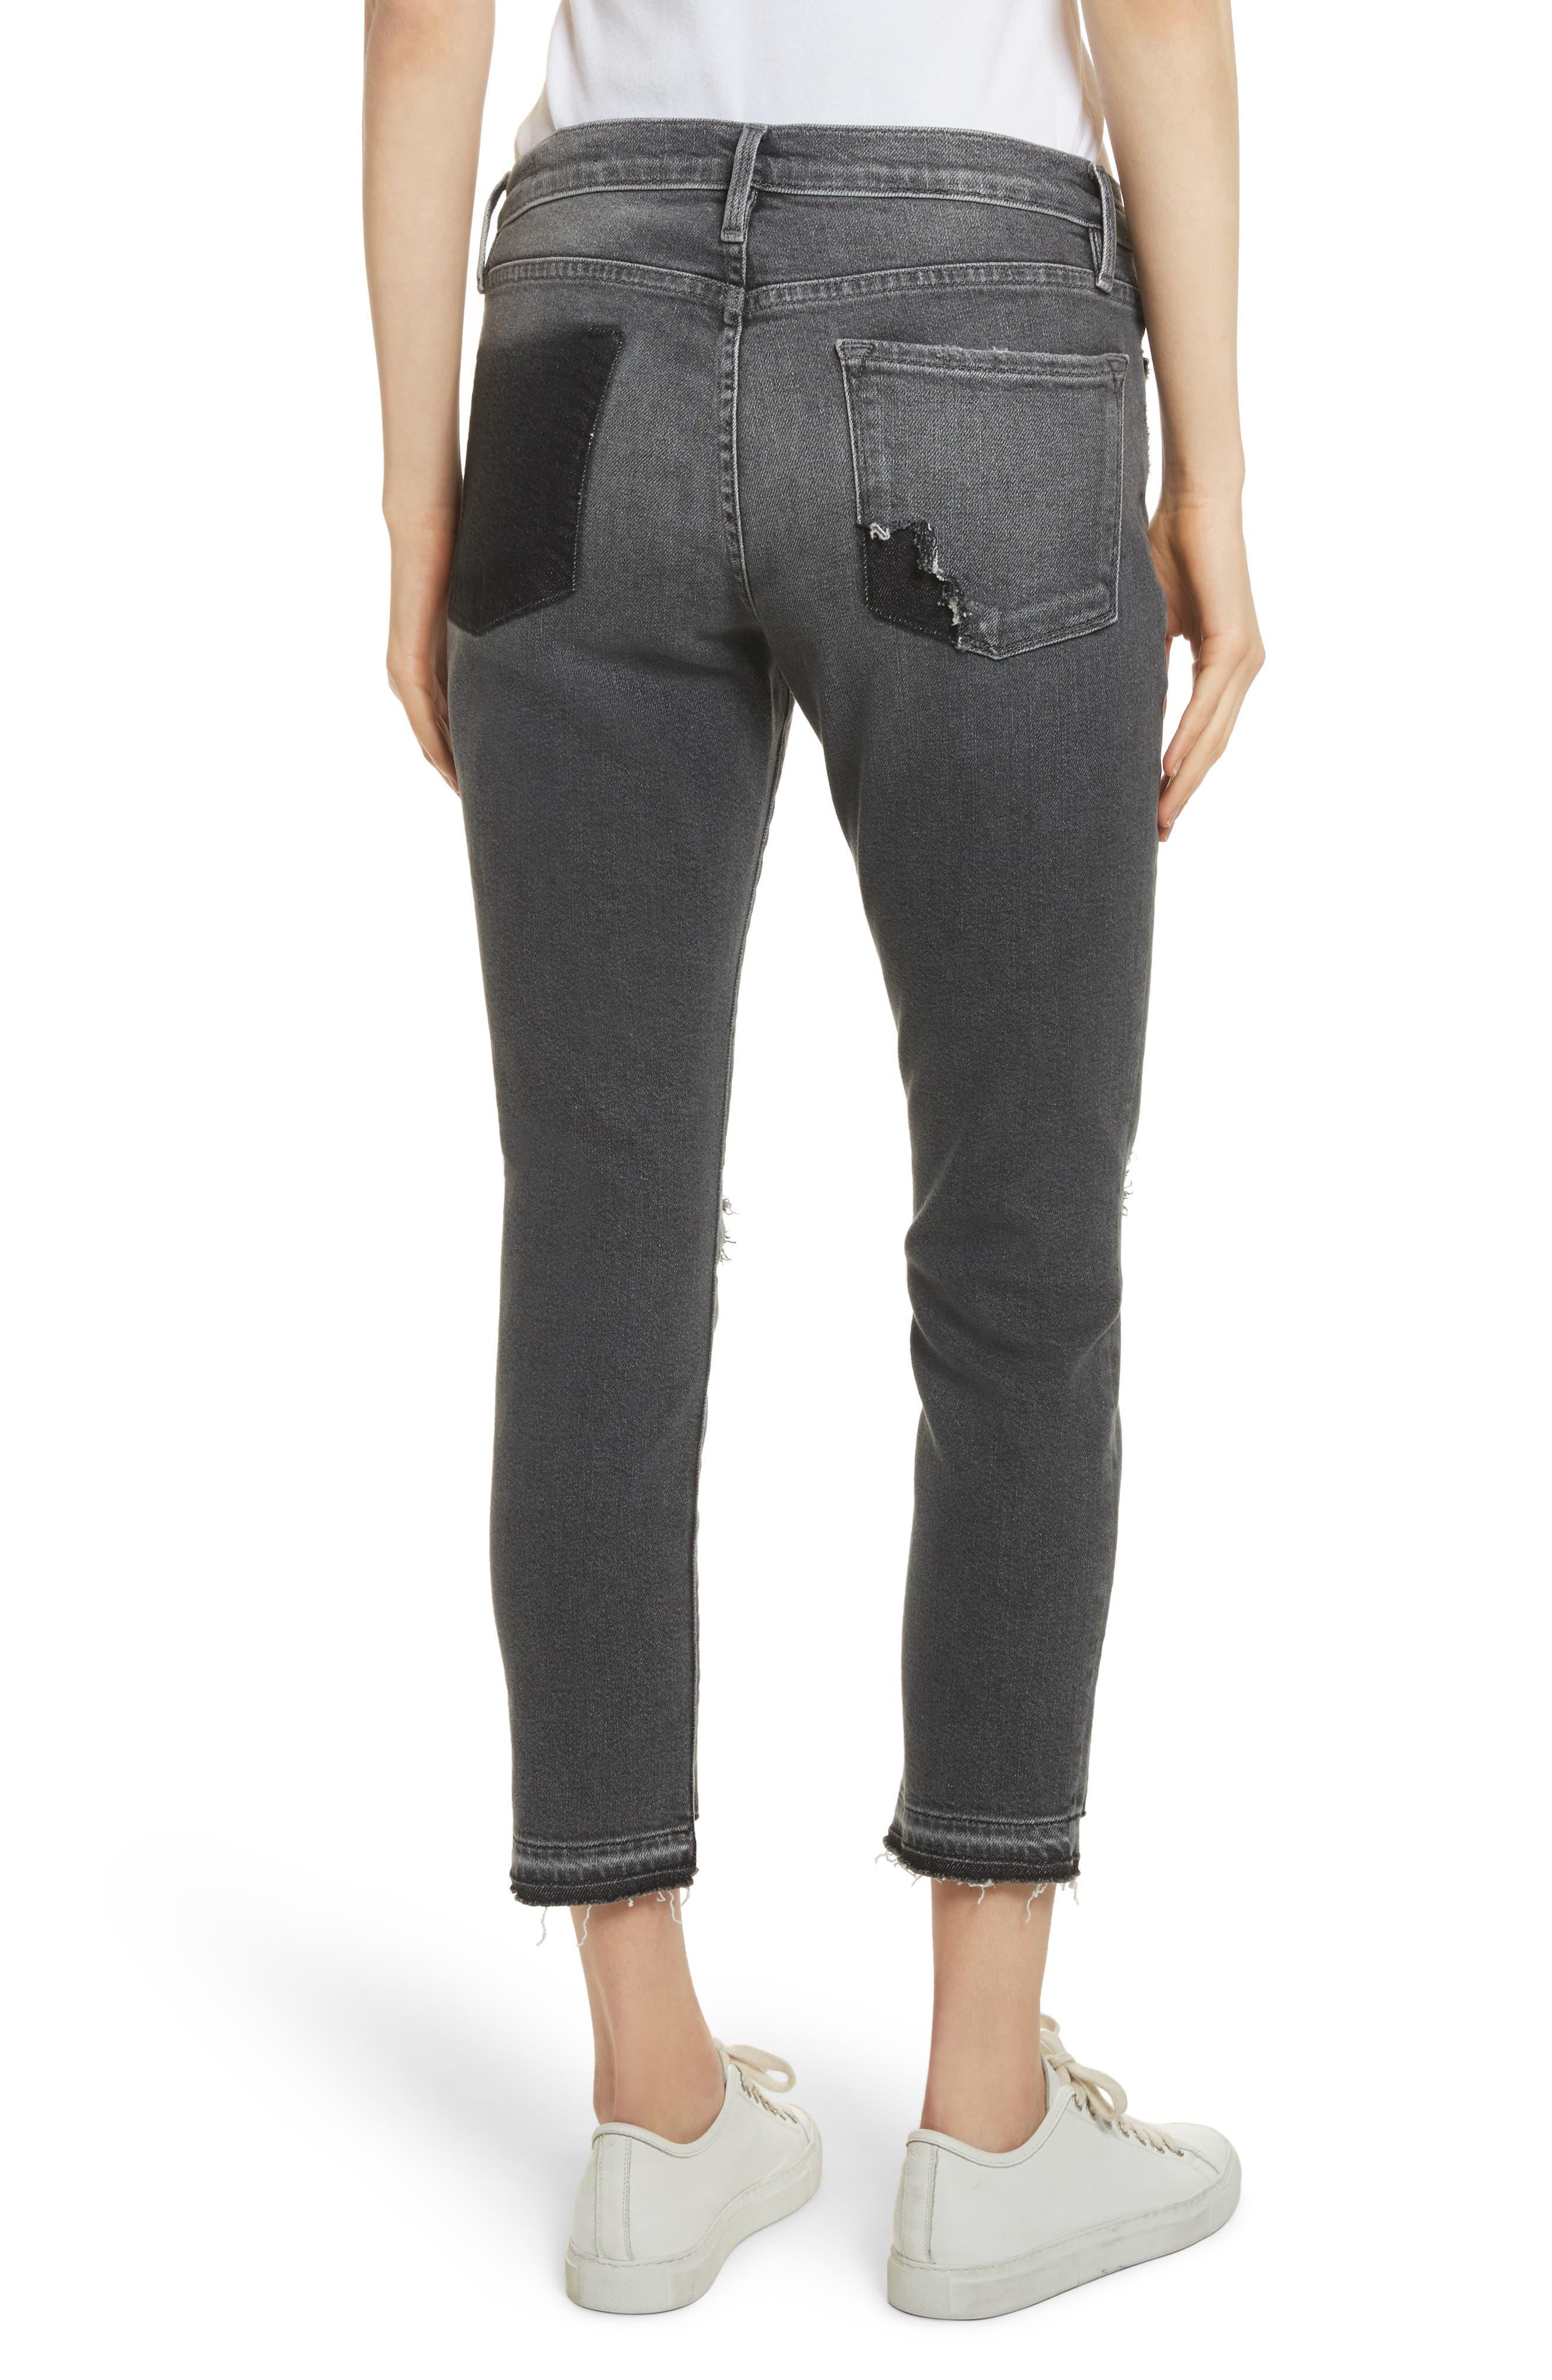 Le Garçon Ripped Released Hem Slim Jeans,                             Alternate thumbnail 2, color,                             050